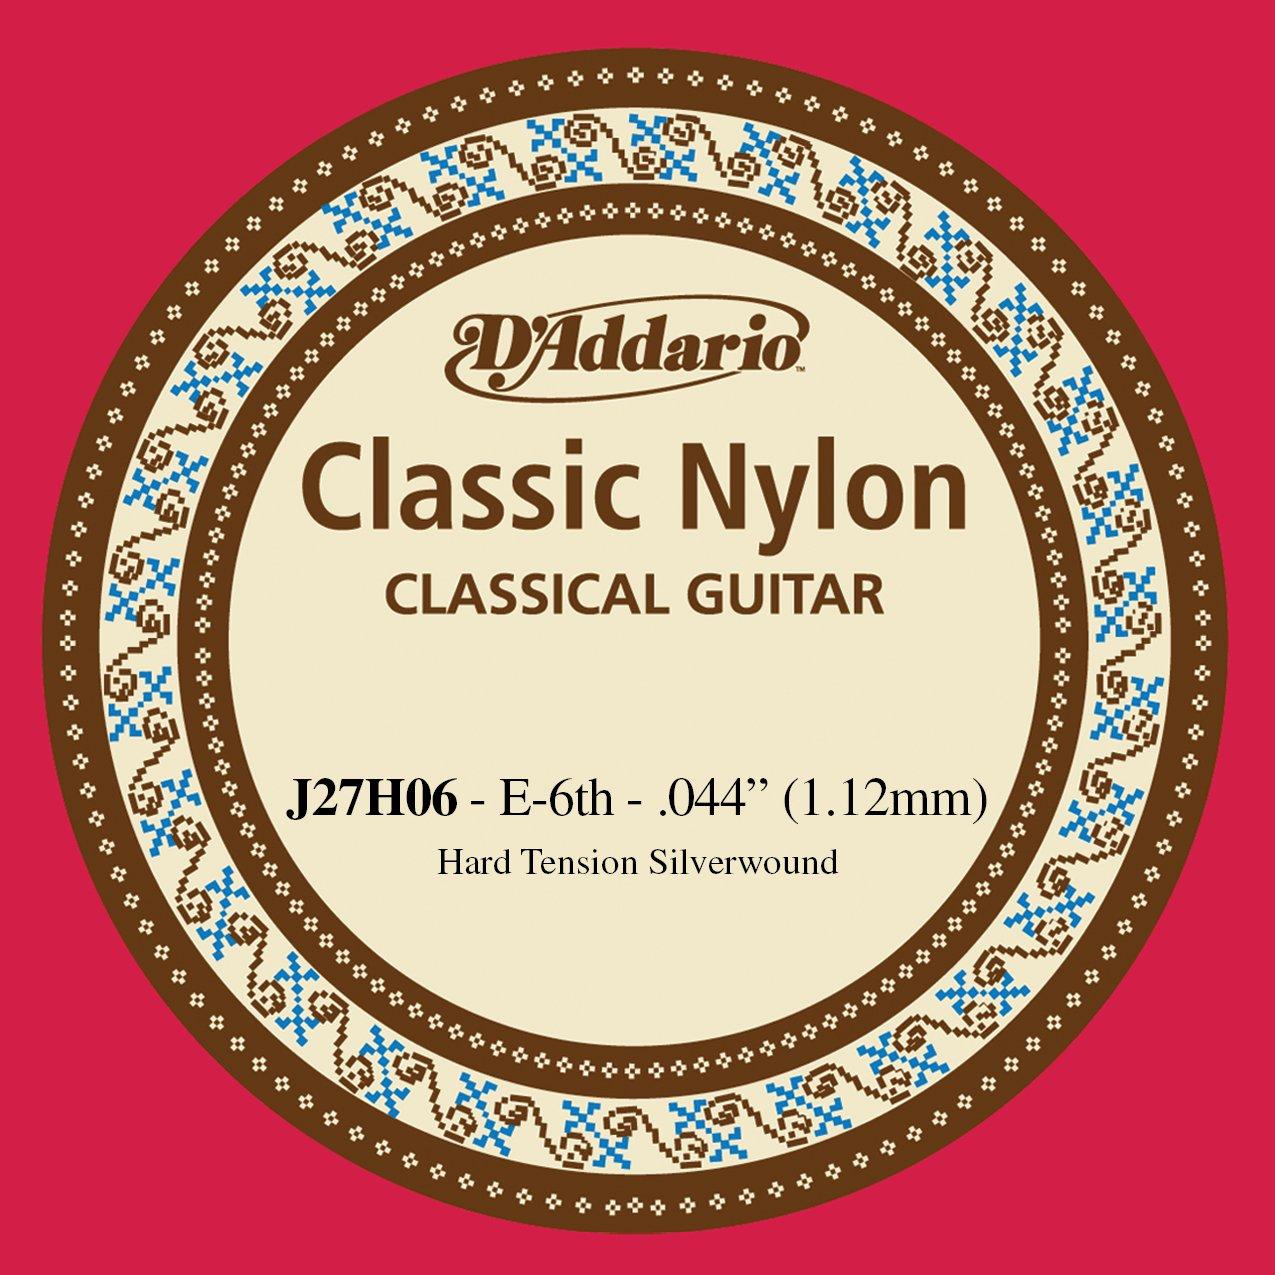 DAddario J27H06 Corda Singola Classica J27 Classic Nylon